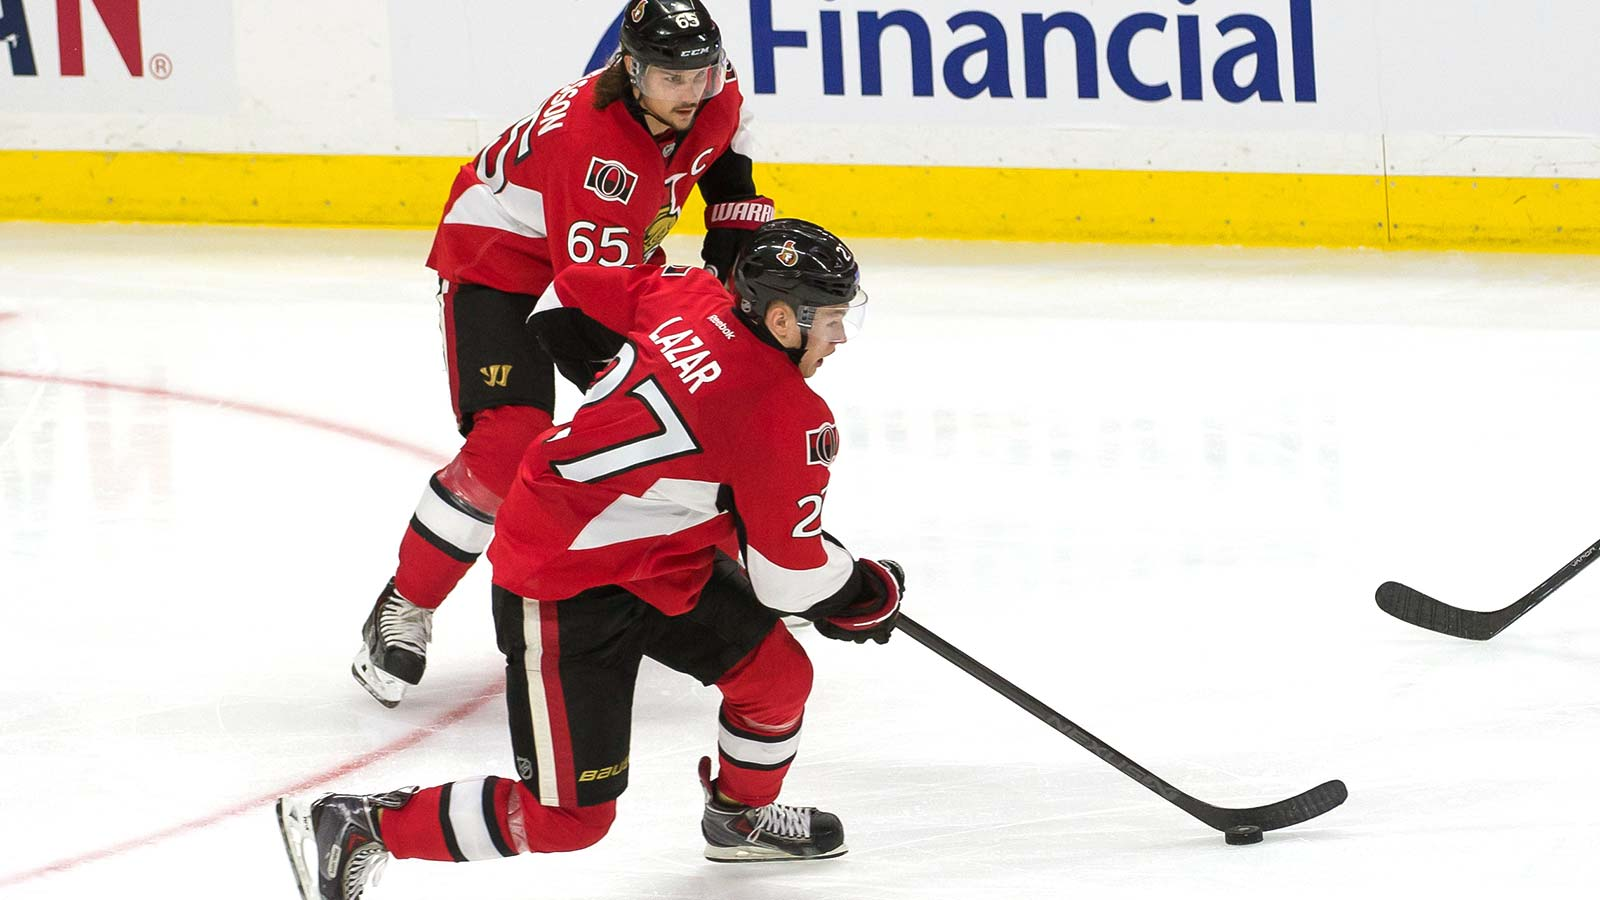 Ottawa Senators rookie offers comical take on veteran's back surgery